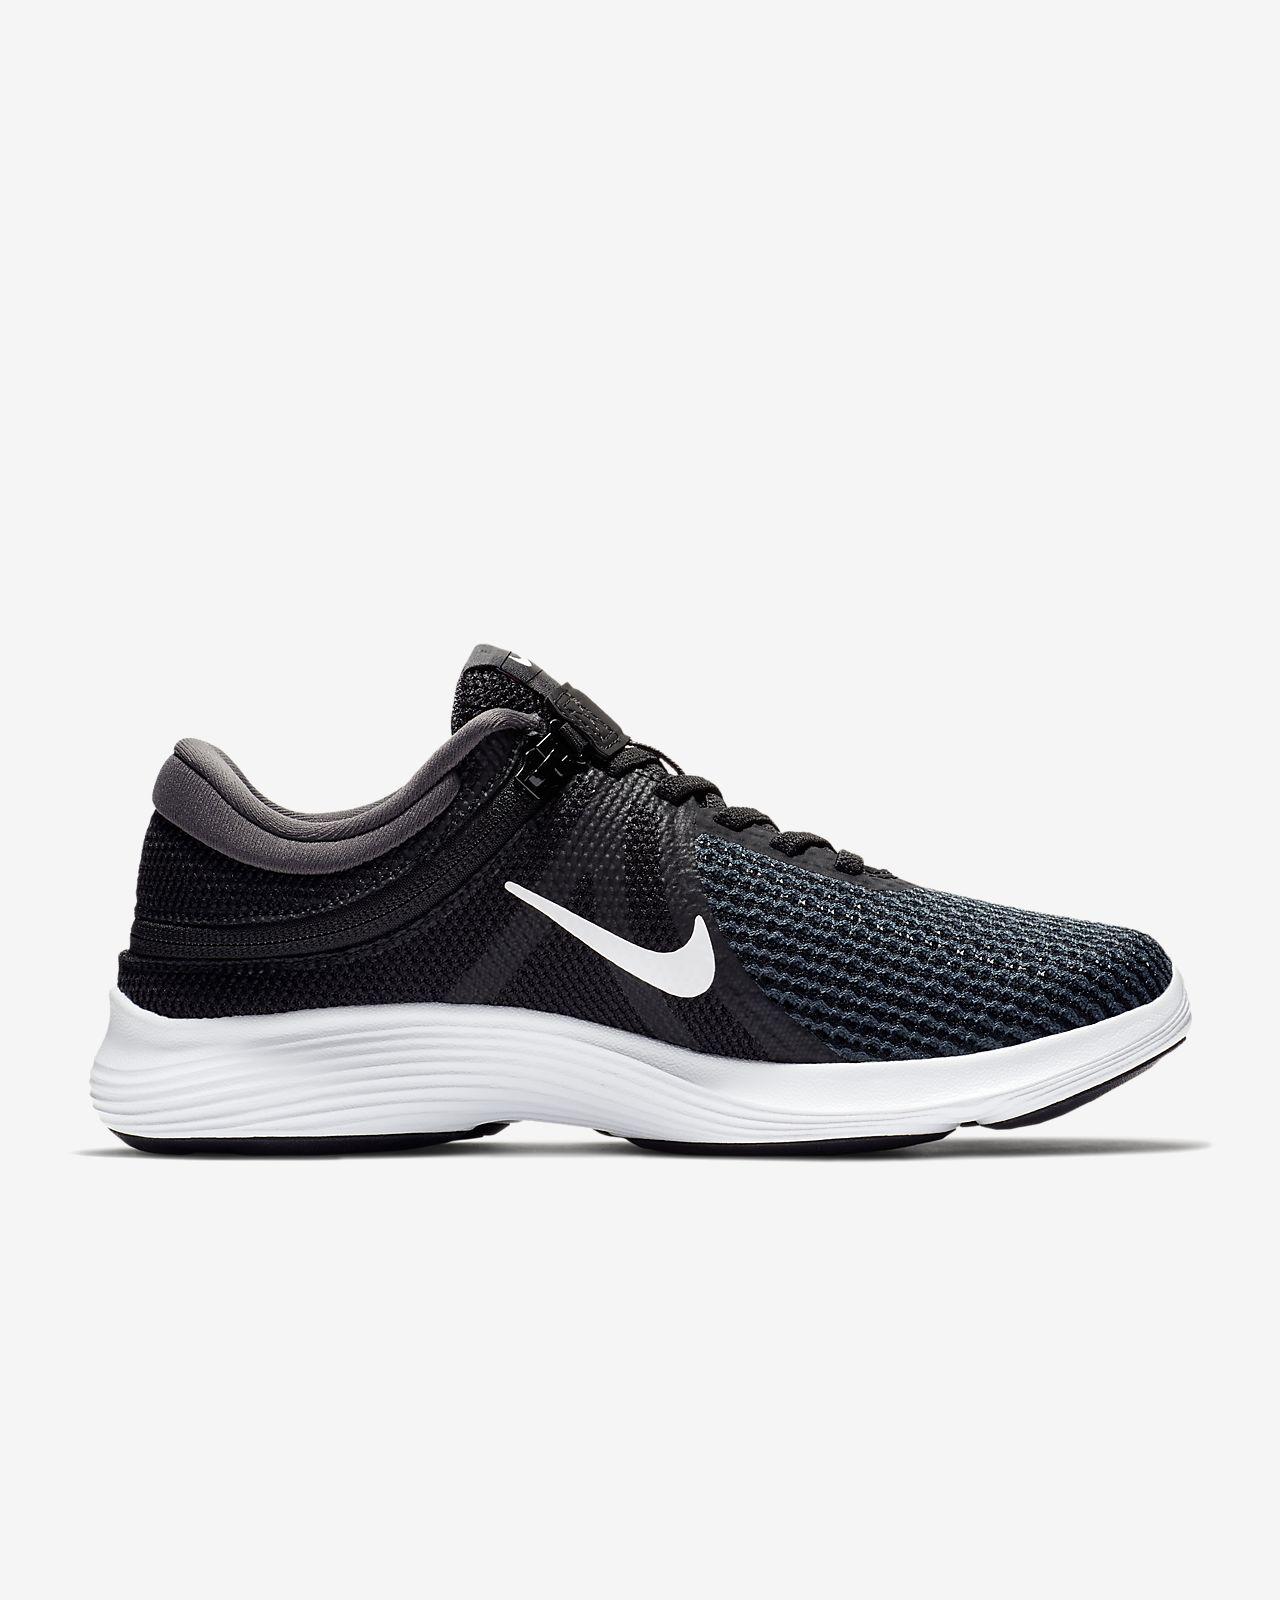 b64d3093c09c Nike Revolution 4 FlyEase Women s Running Shoe. Nike.com